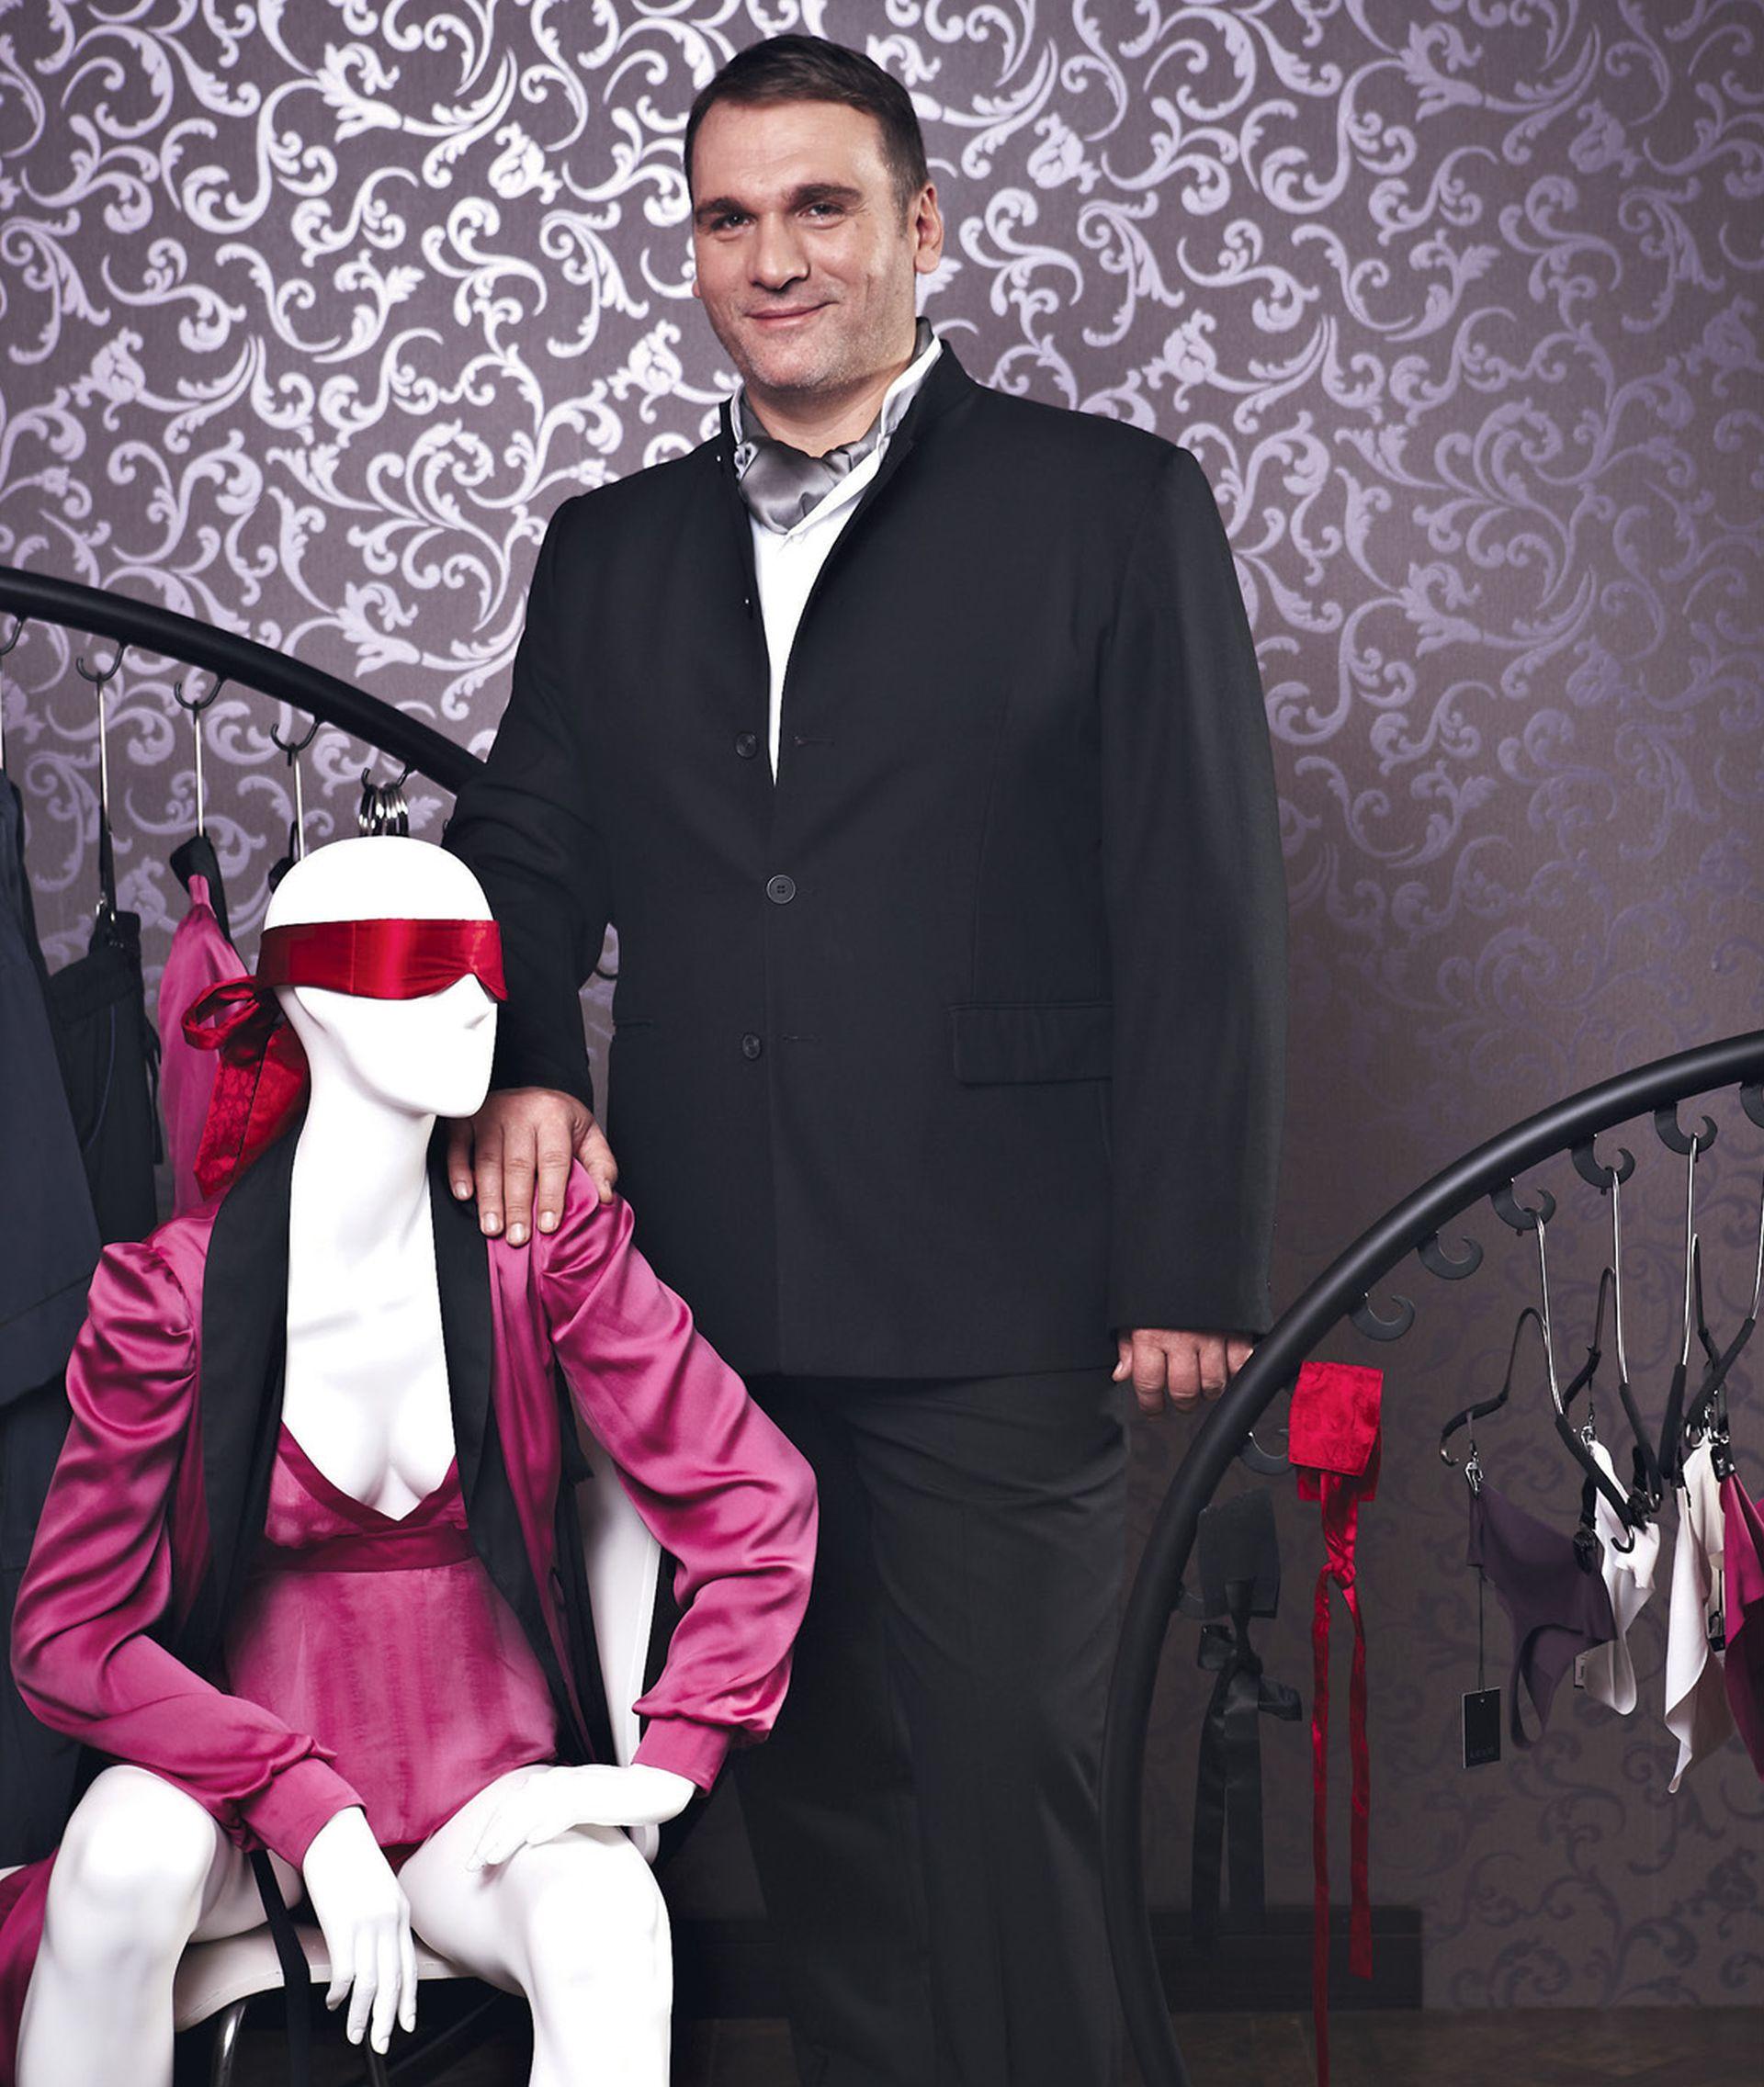 Najbolja seksualna pomagala s potpisom Hrvata iz Bosne